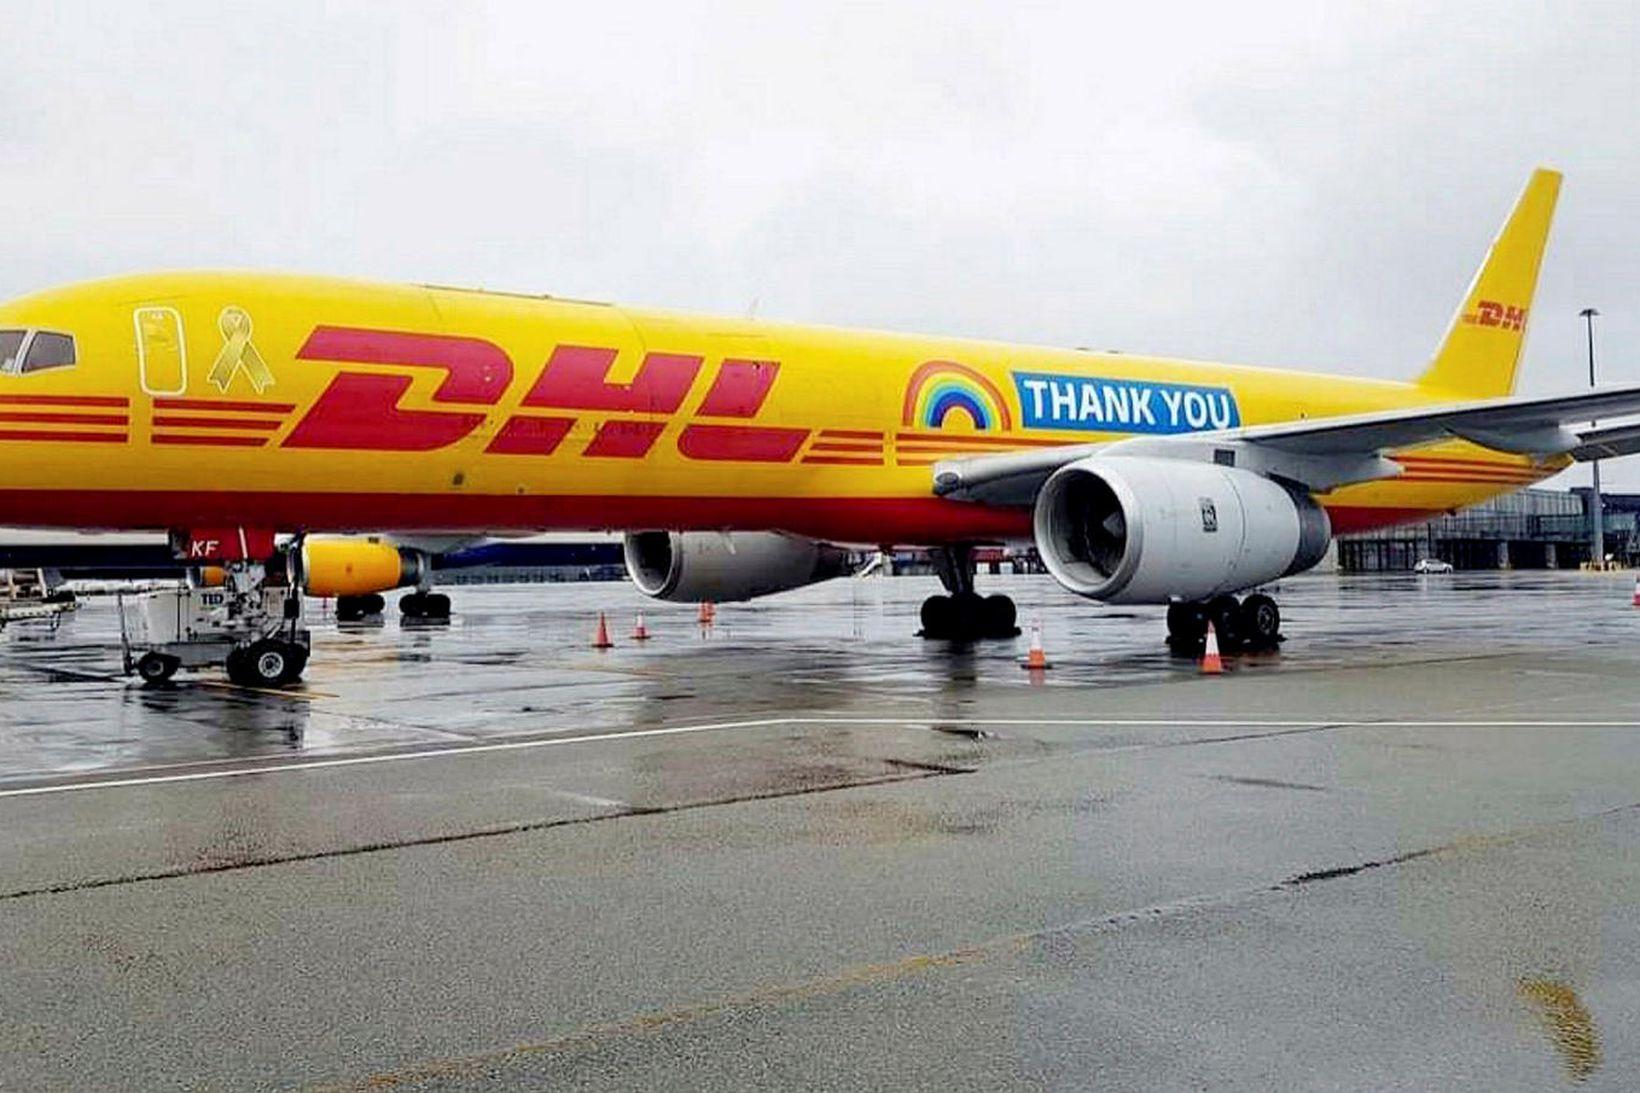 "DHL-vélin flaug um alla Evrópu merkt ""Thank You"" og regnboga …"